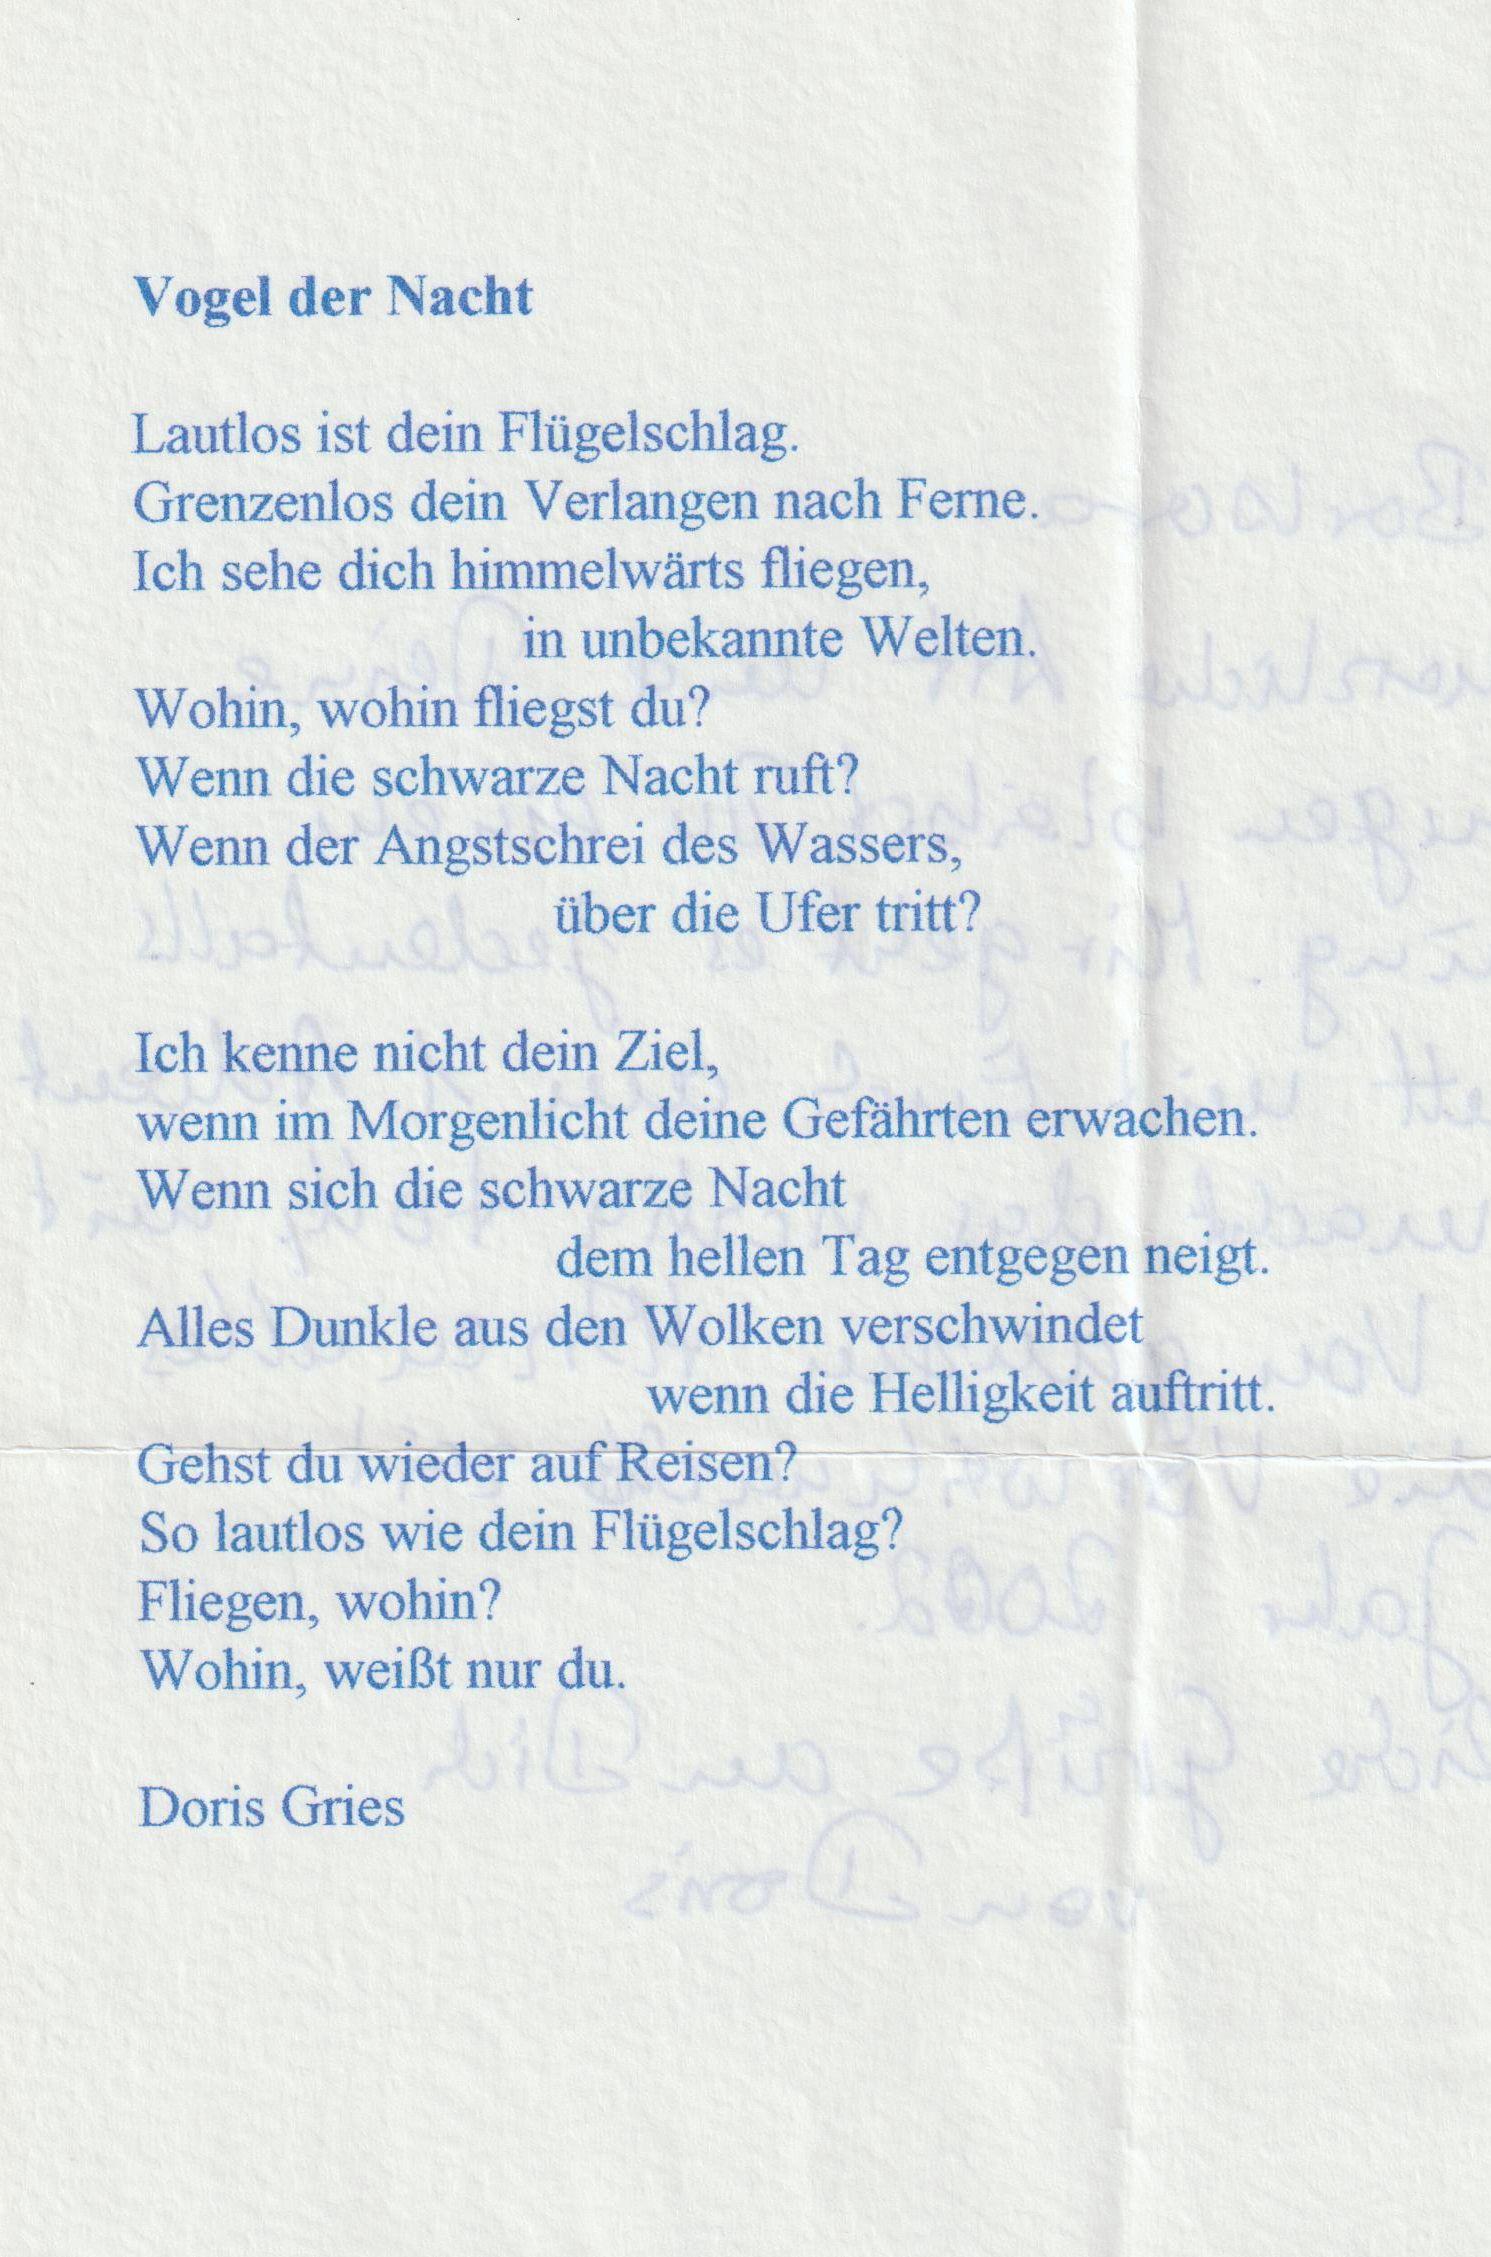 Gedicht Doris Gries